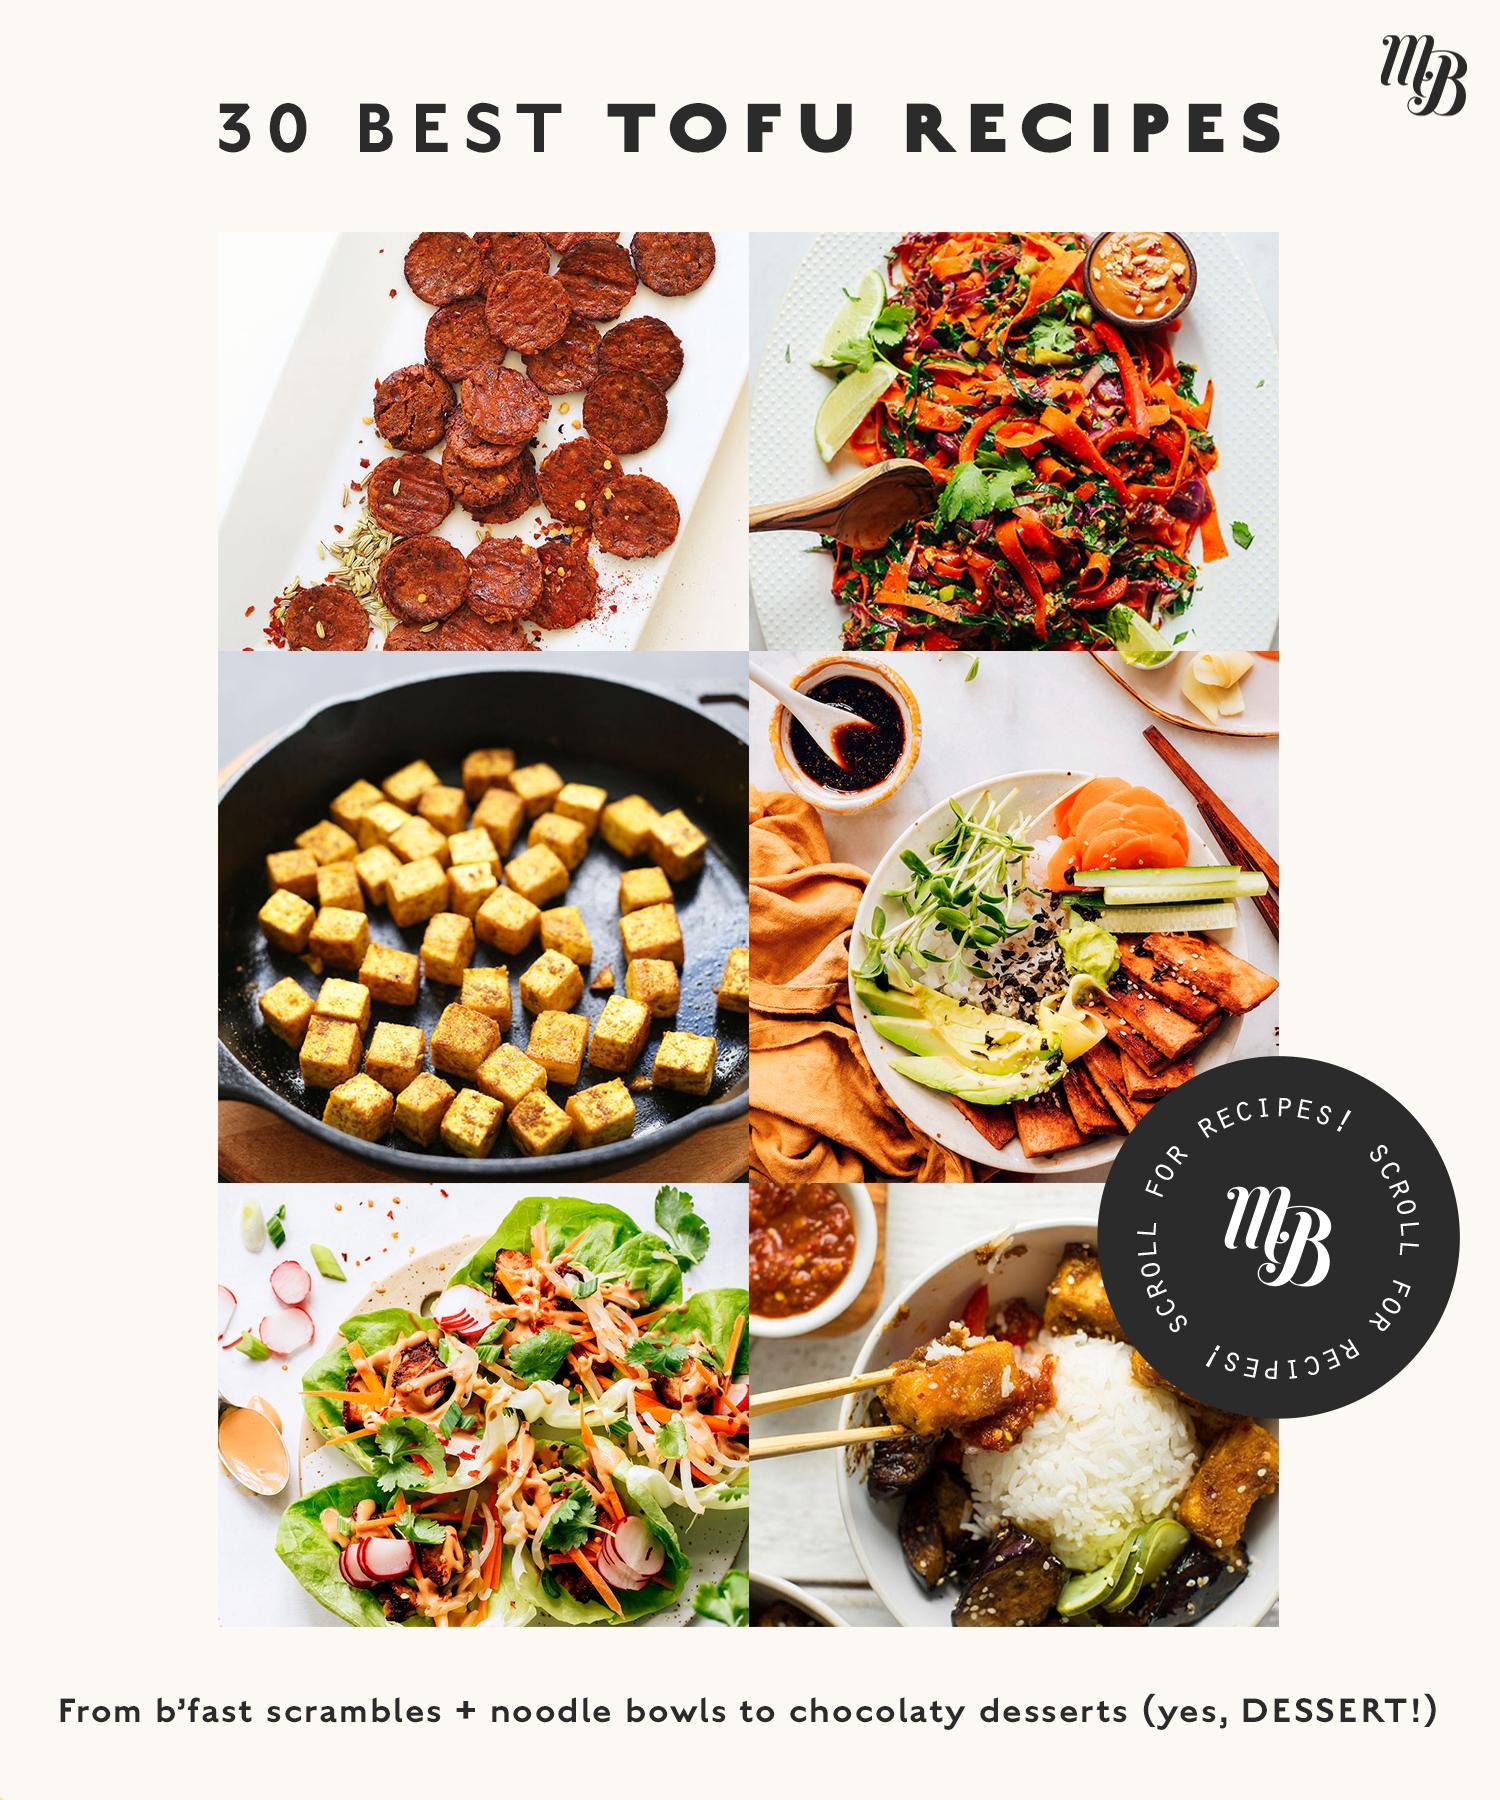 Vegan pepperoni, bowls, lettuce wraps, and other tofu recipes